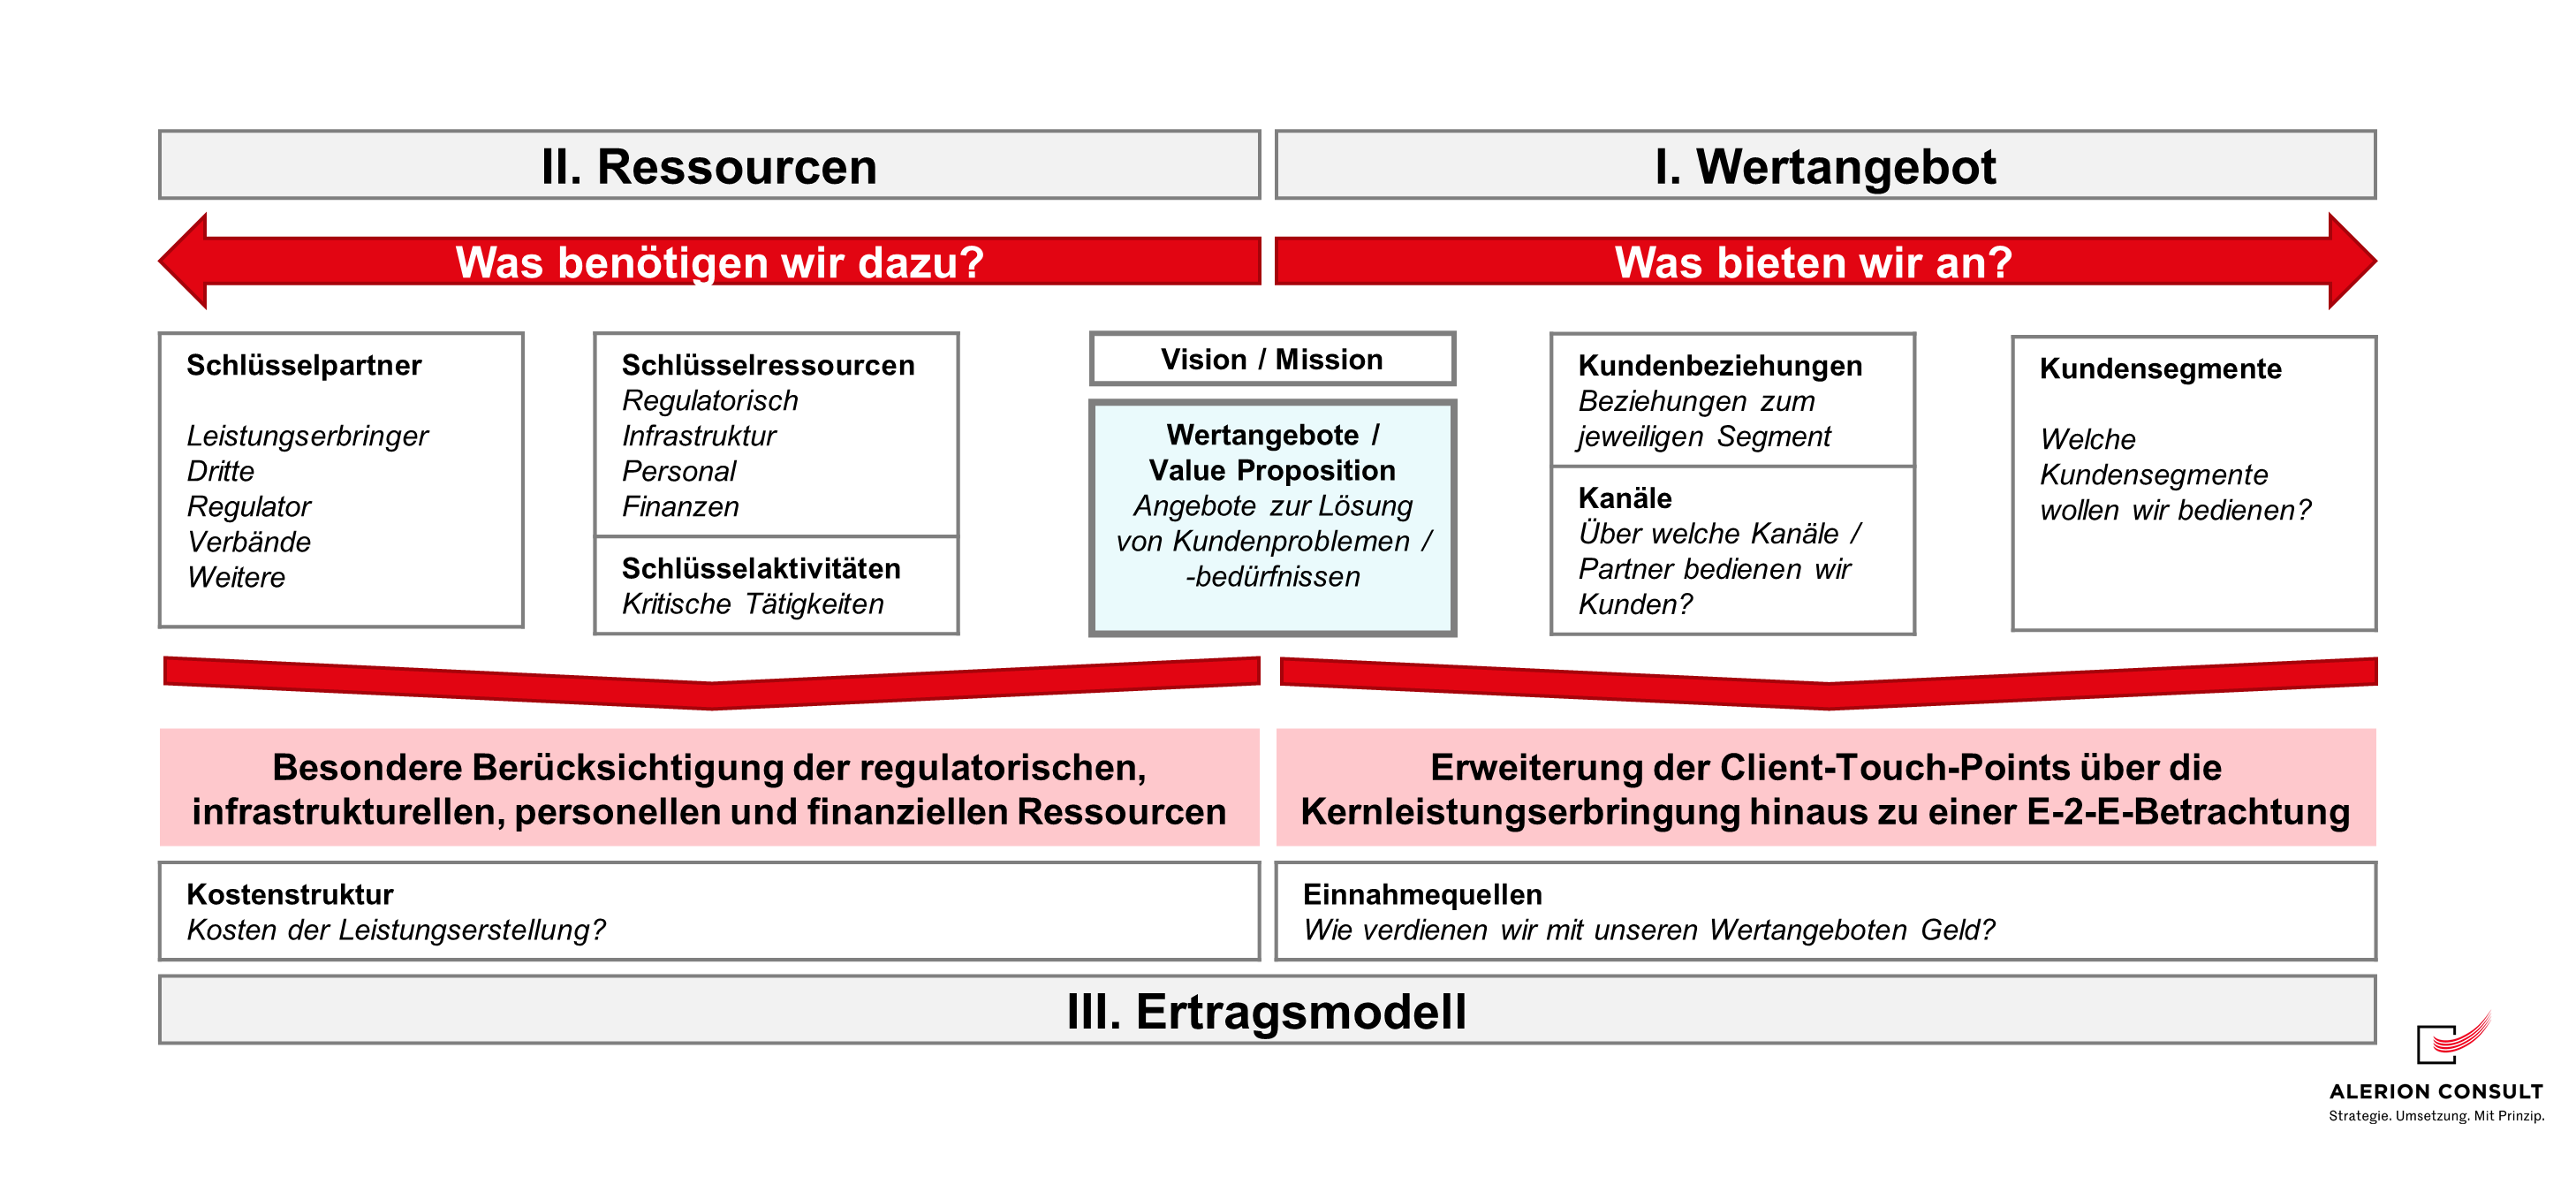 Ertragsmodell - Osterwalder